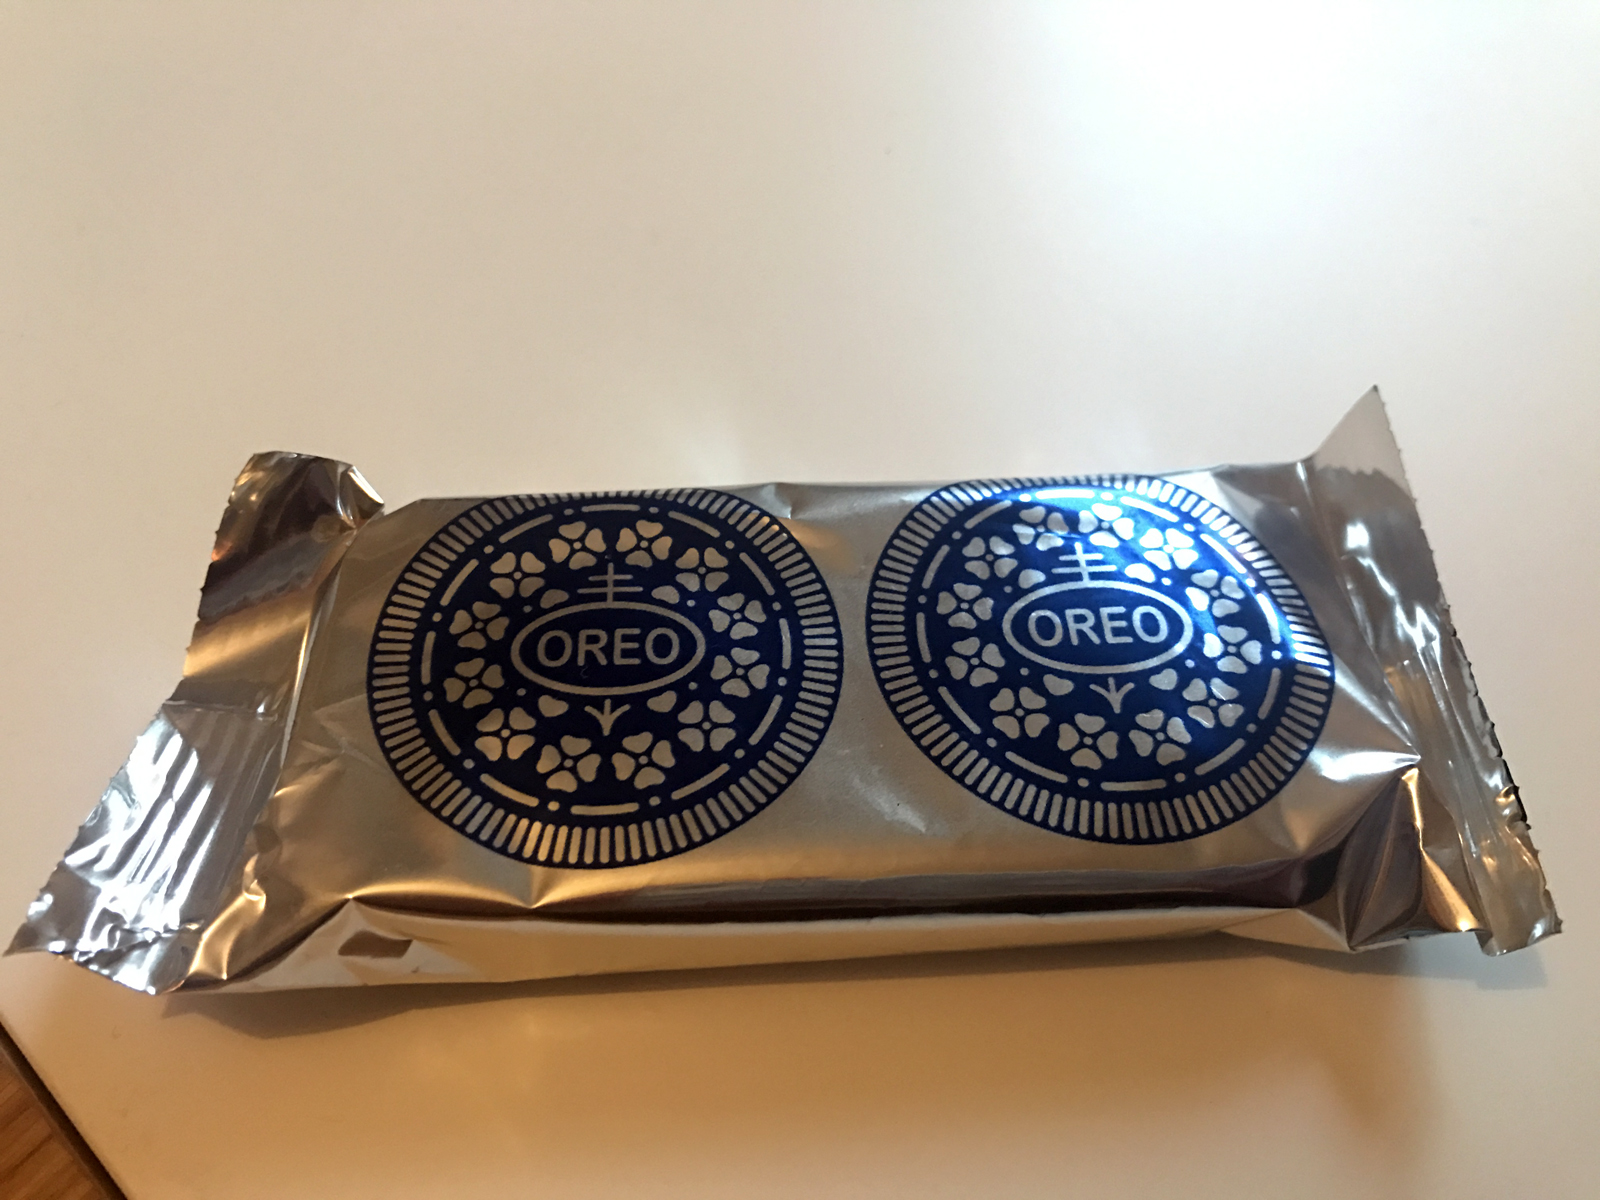 Chokladöverdragna Oreos